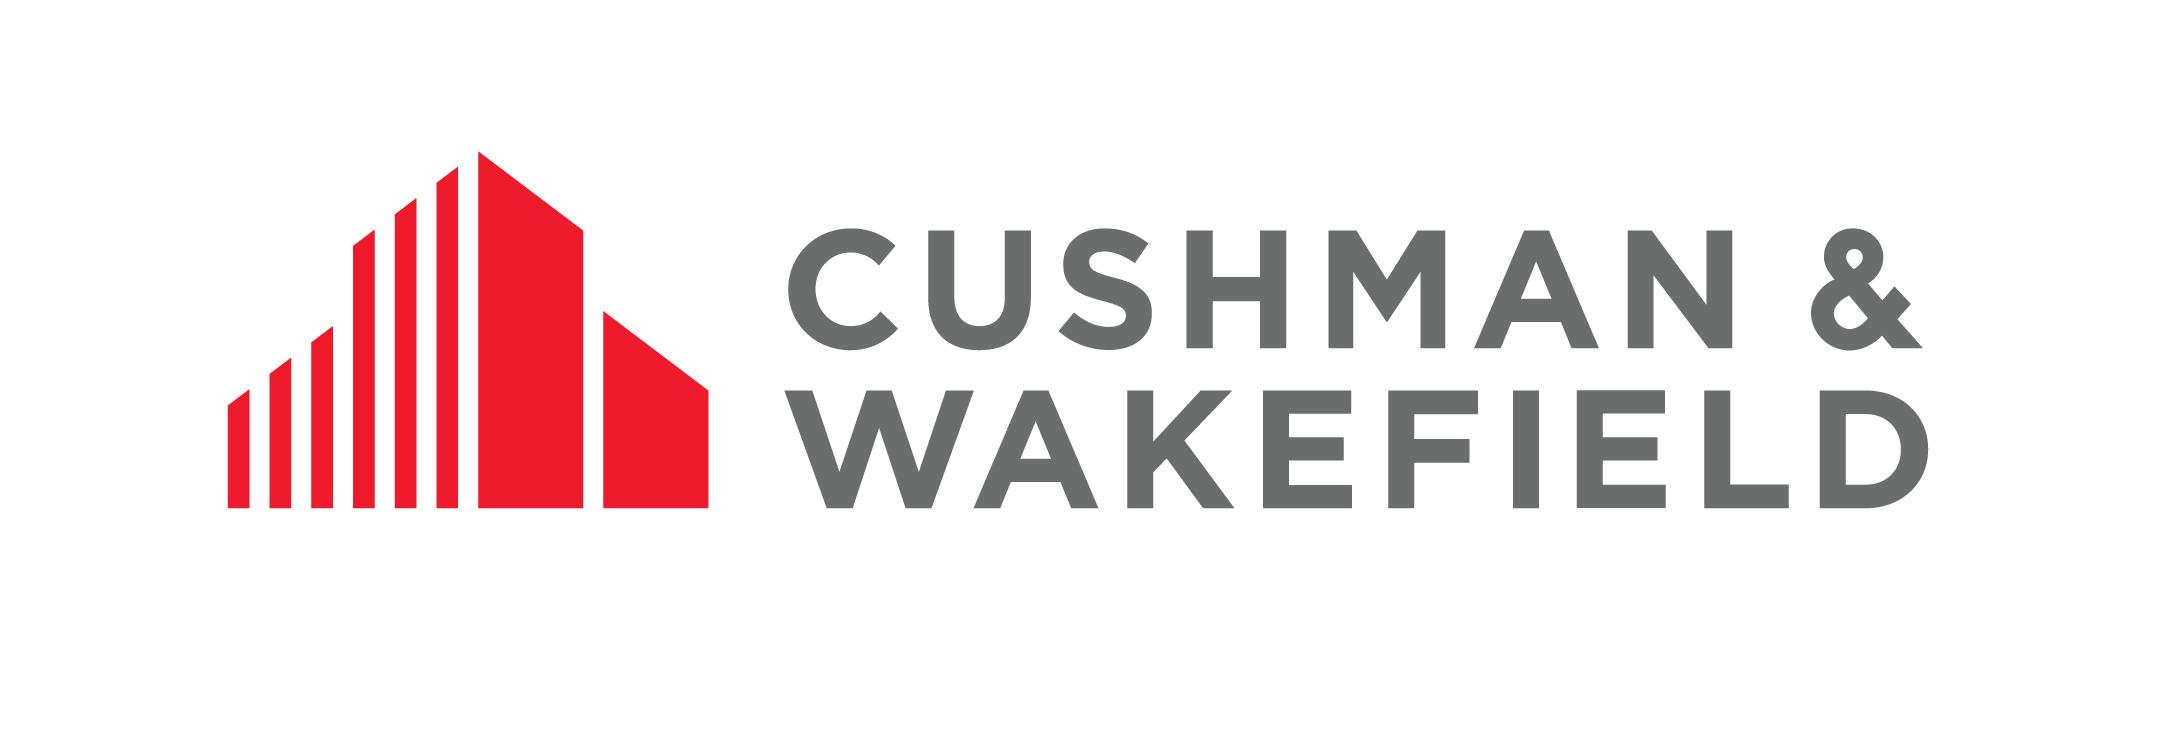 Cushman & Wakefield, Inc. Company Logo